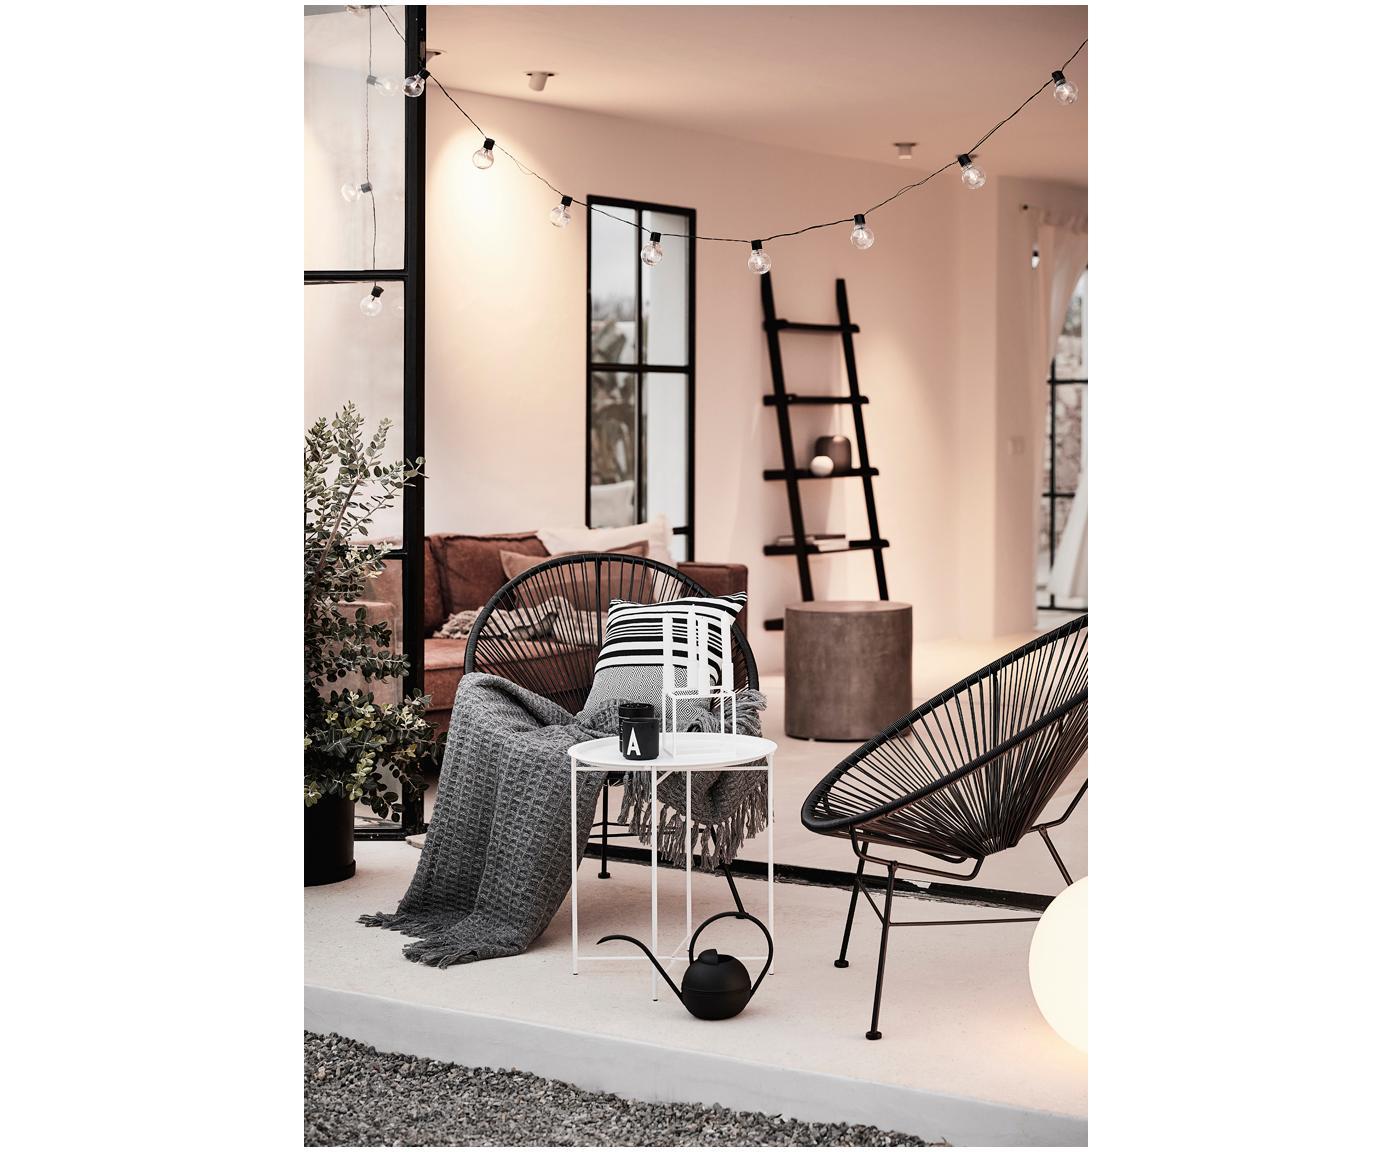 Kandelaar Kubus, Gelakt staal, Wit, 14 x 20 cm